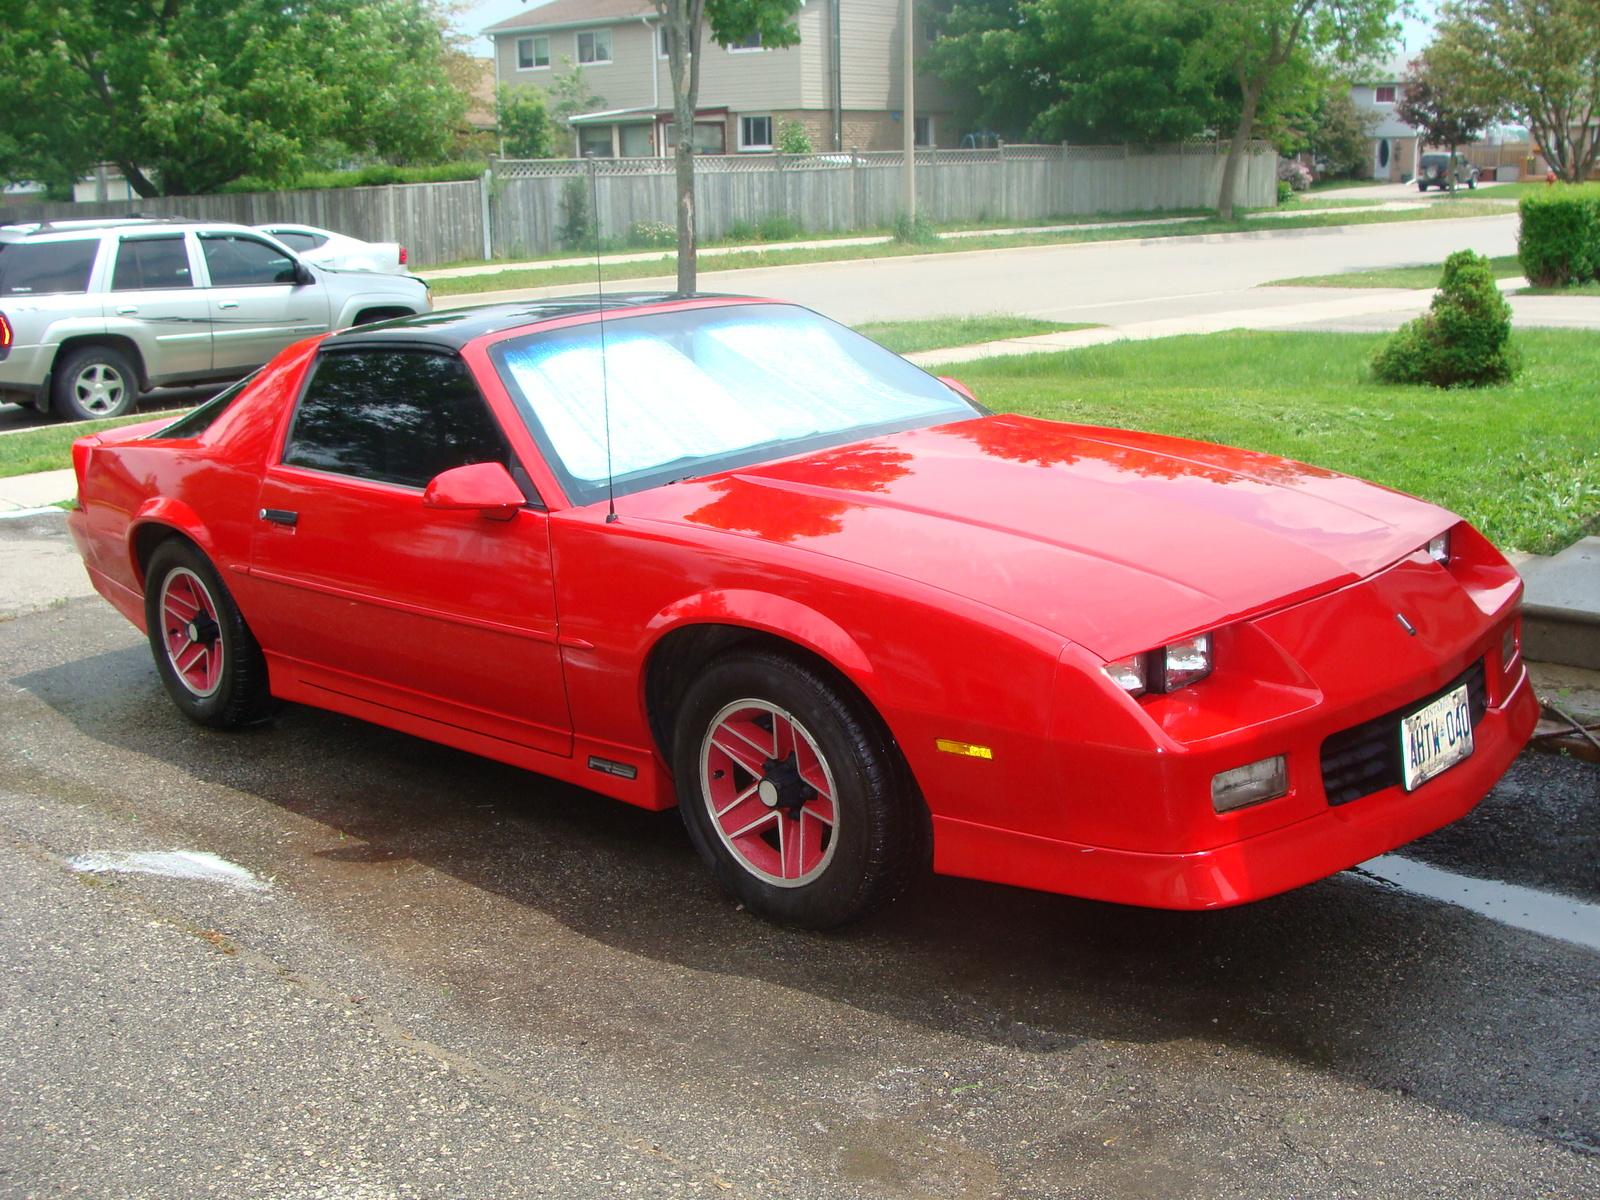 1989 Chevrolet Camaro - Pictures